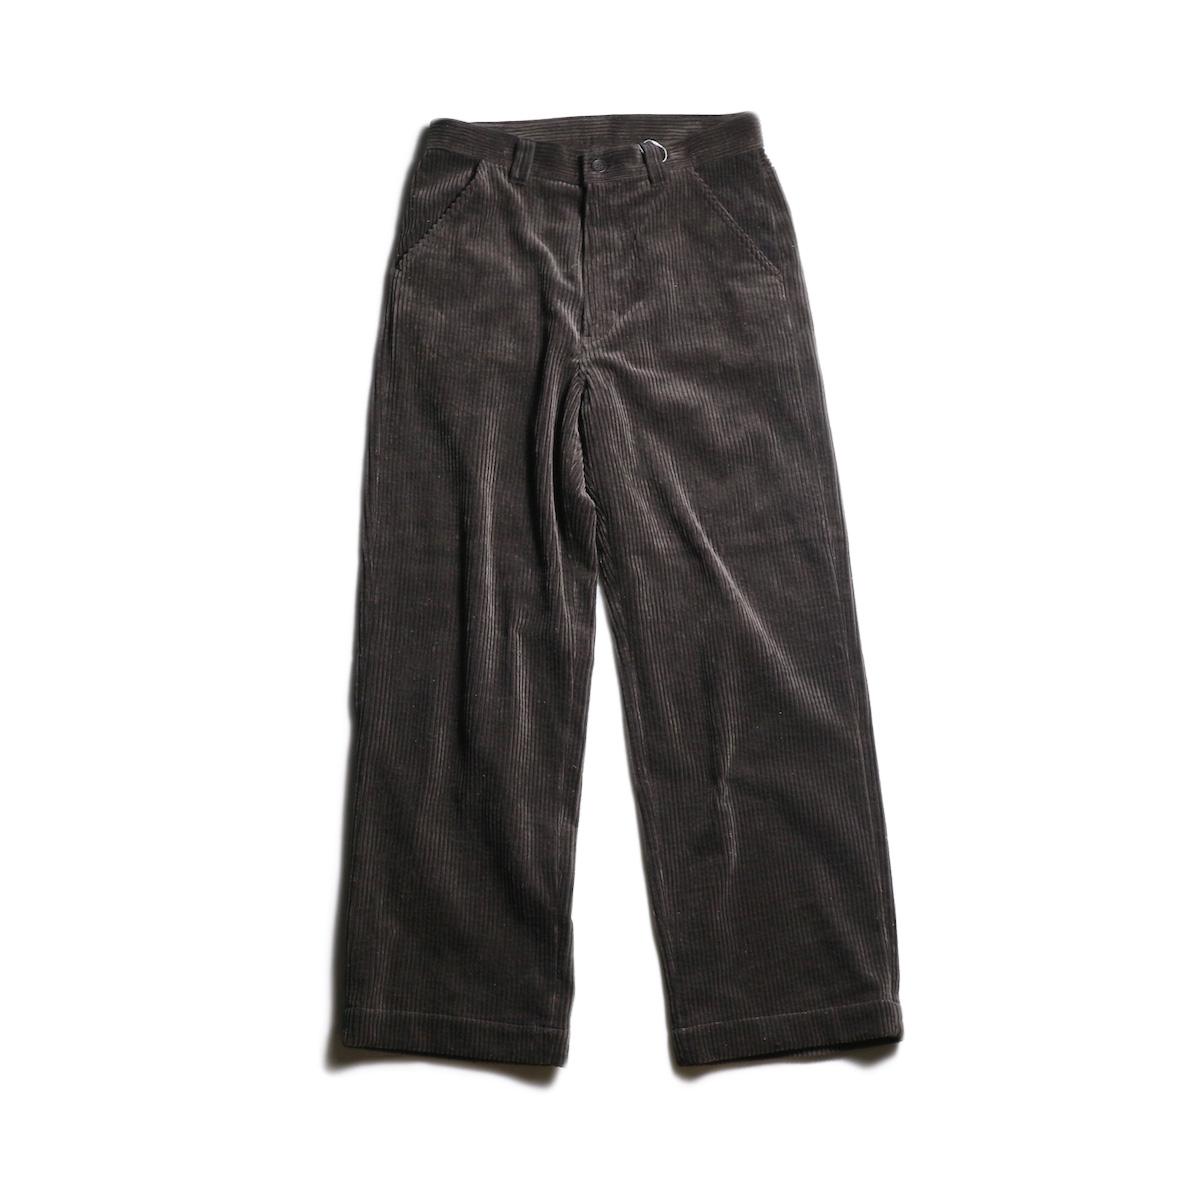 EVCON / CORDUROY WIDE PANTS (Brown)